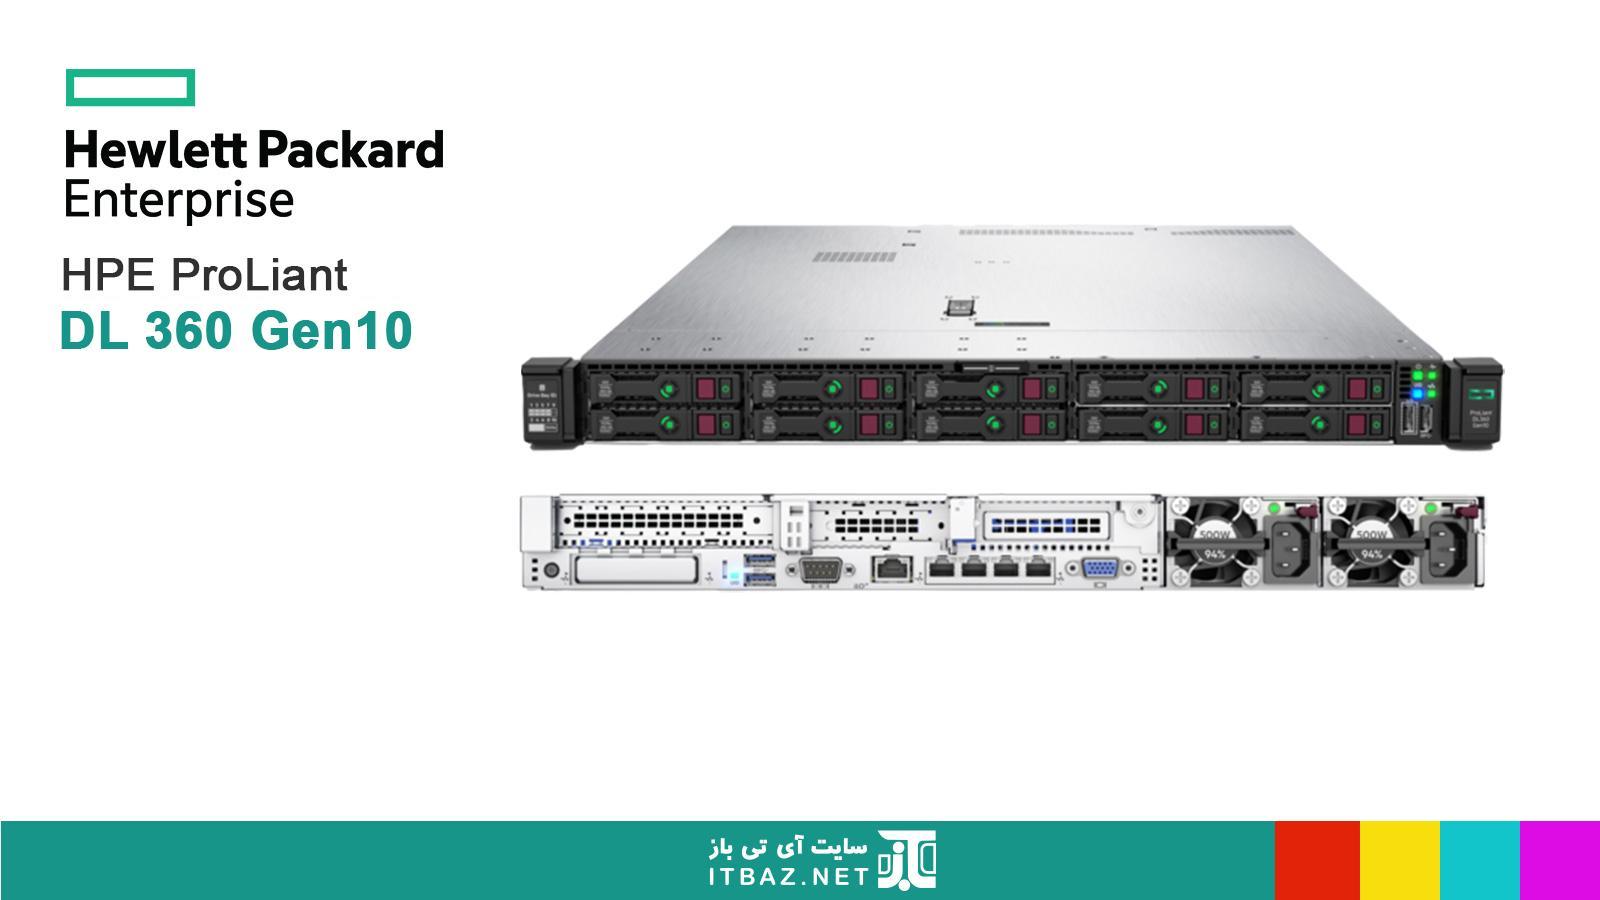 سرور hp dl360 g10، مشخصات سرور hp dl360 g10، خرید سرور hp dl360 g10، قیمت سرور hp dl360 g10